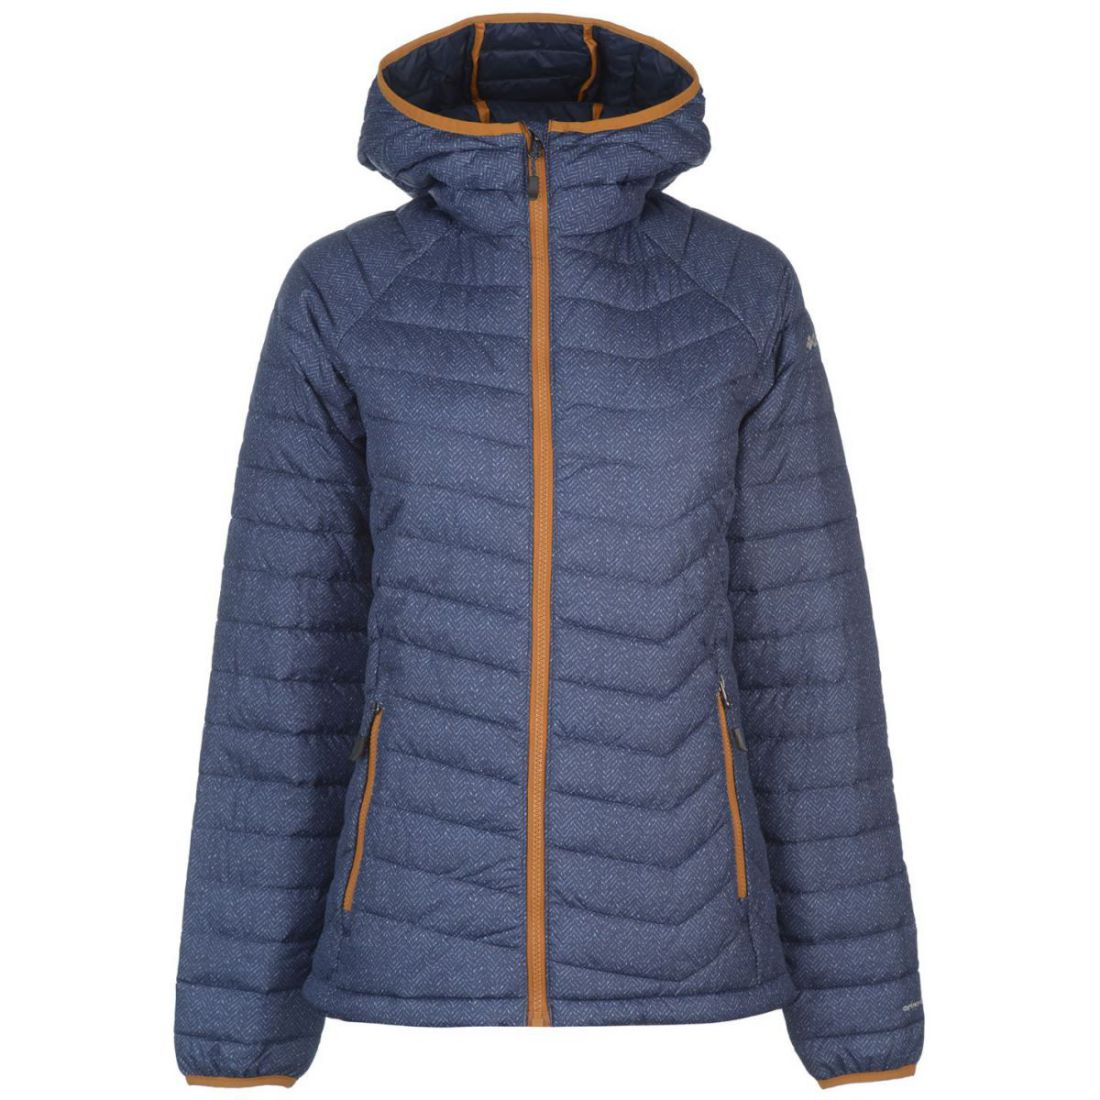 Columbia Powder Jacket Ladies Down Coat Top Full Length Sleeve Chin Guard Hooded